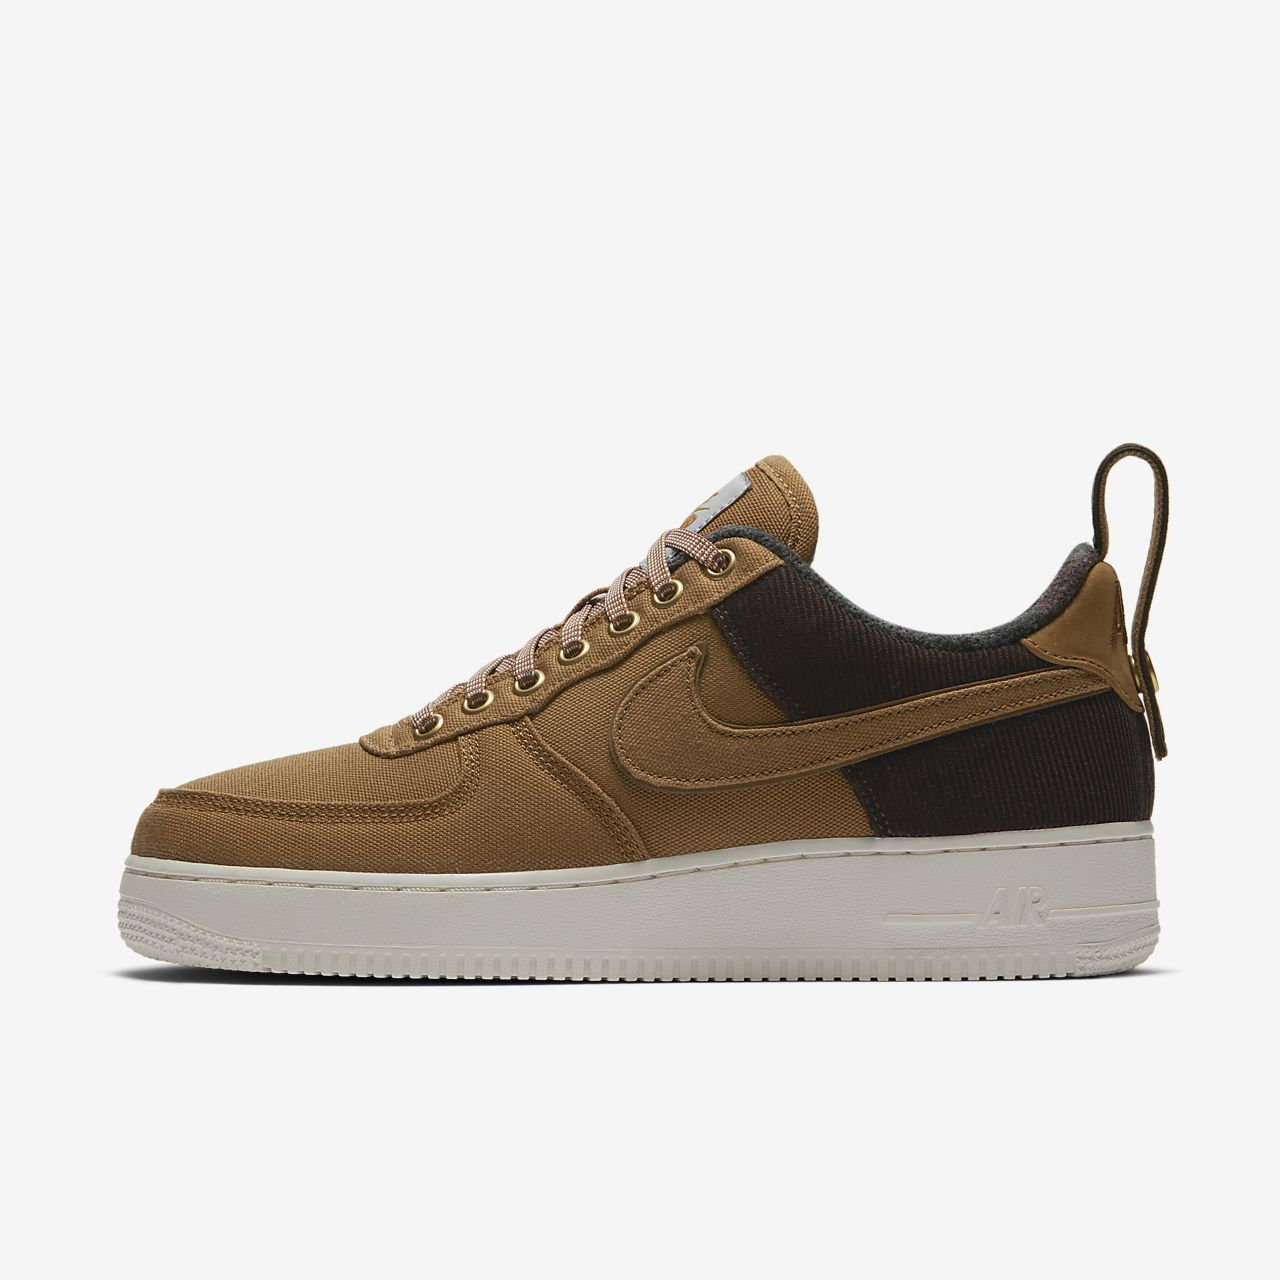 detailed look 65c3d ac4e0 ... Nike x Carhartt WIP Air Force 1-sko til mænd